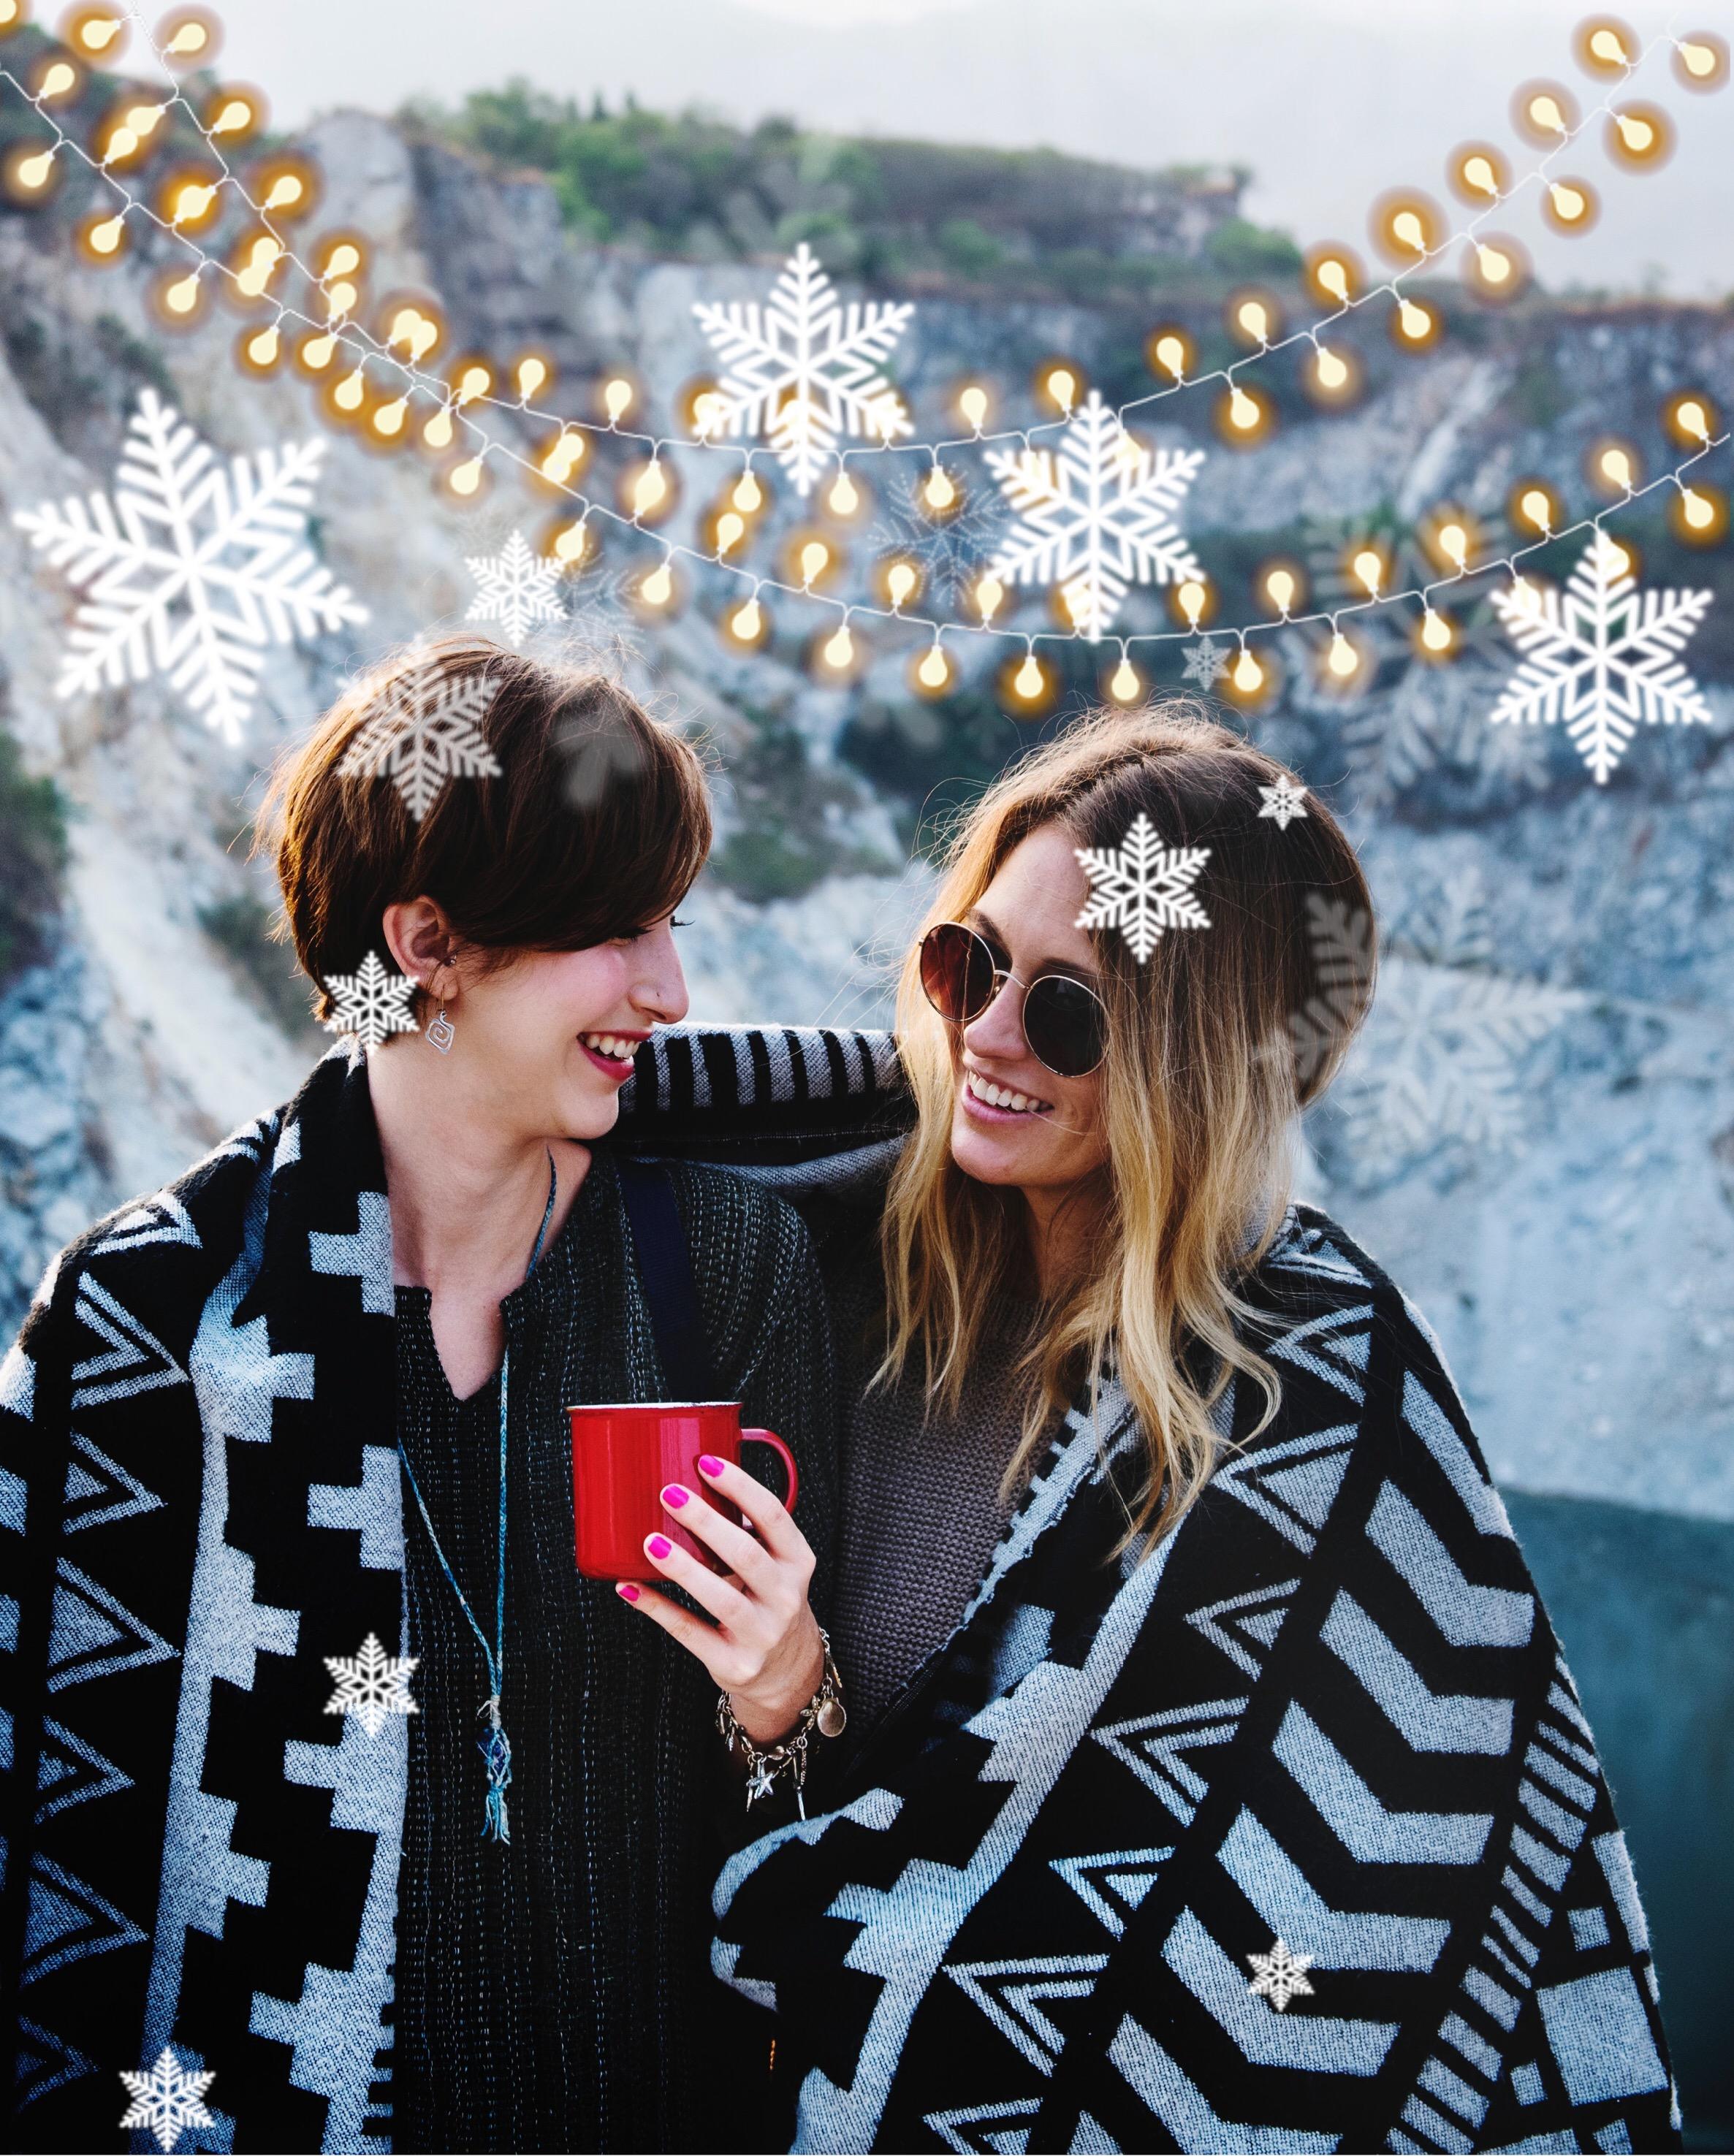 #christmas #lights #snowflakes #winter #holidays #freetoedit